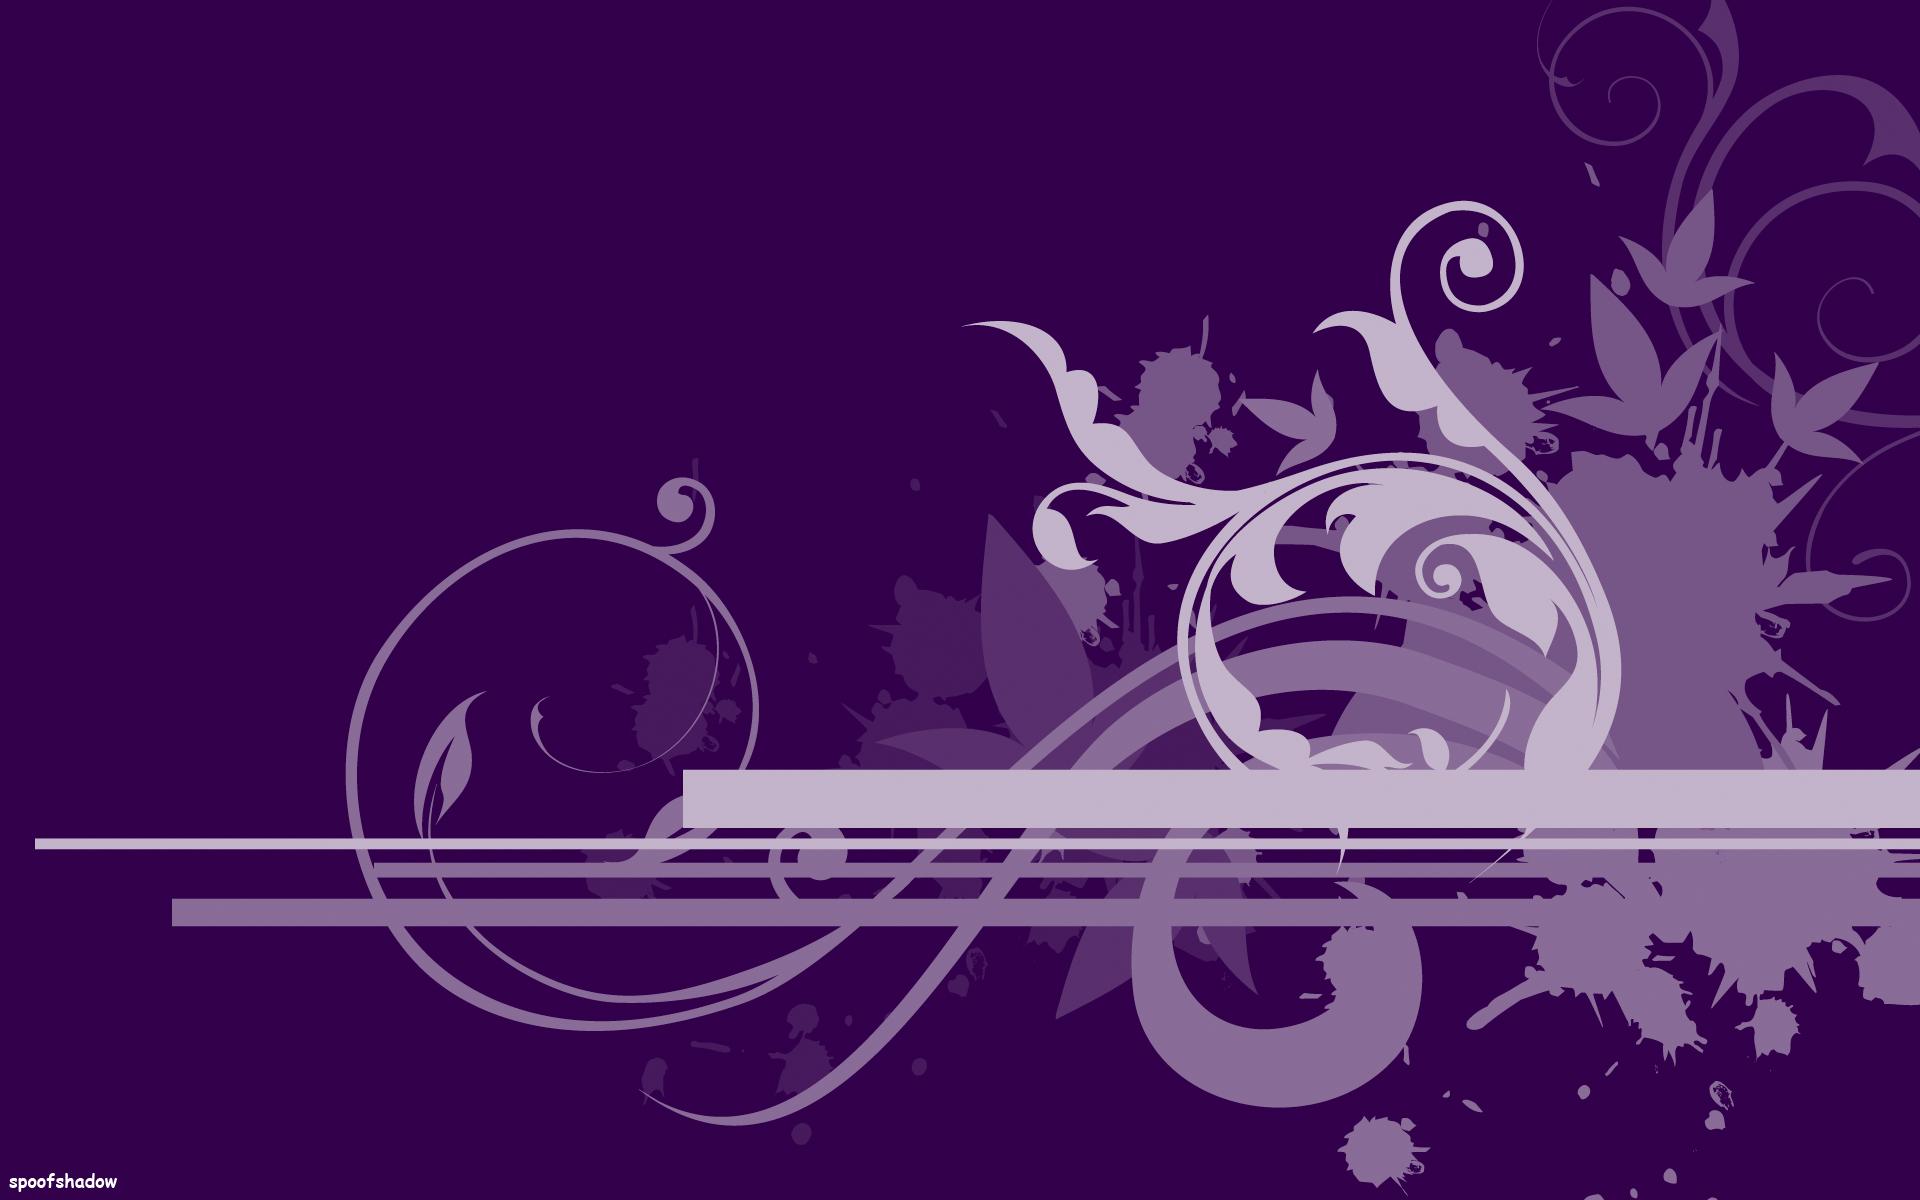 taste like purple by spoofshadow